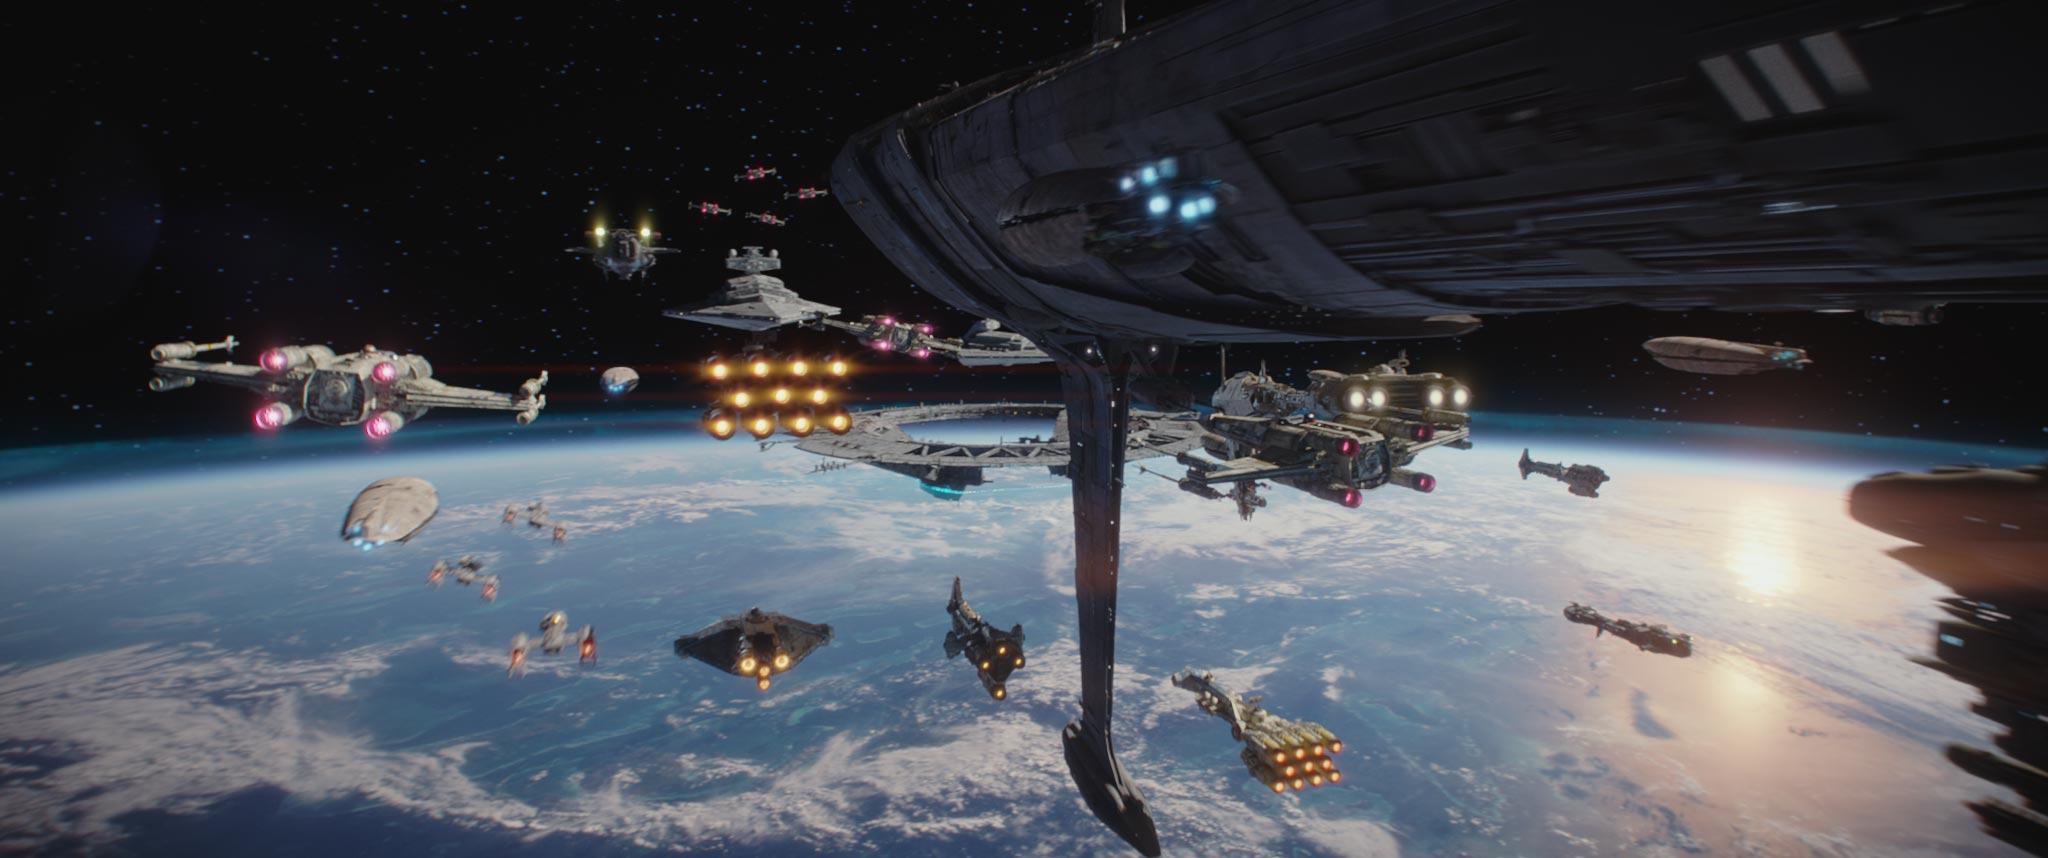 Výsledek obrázku pro star wars battle scarif